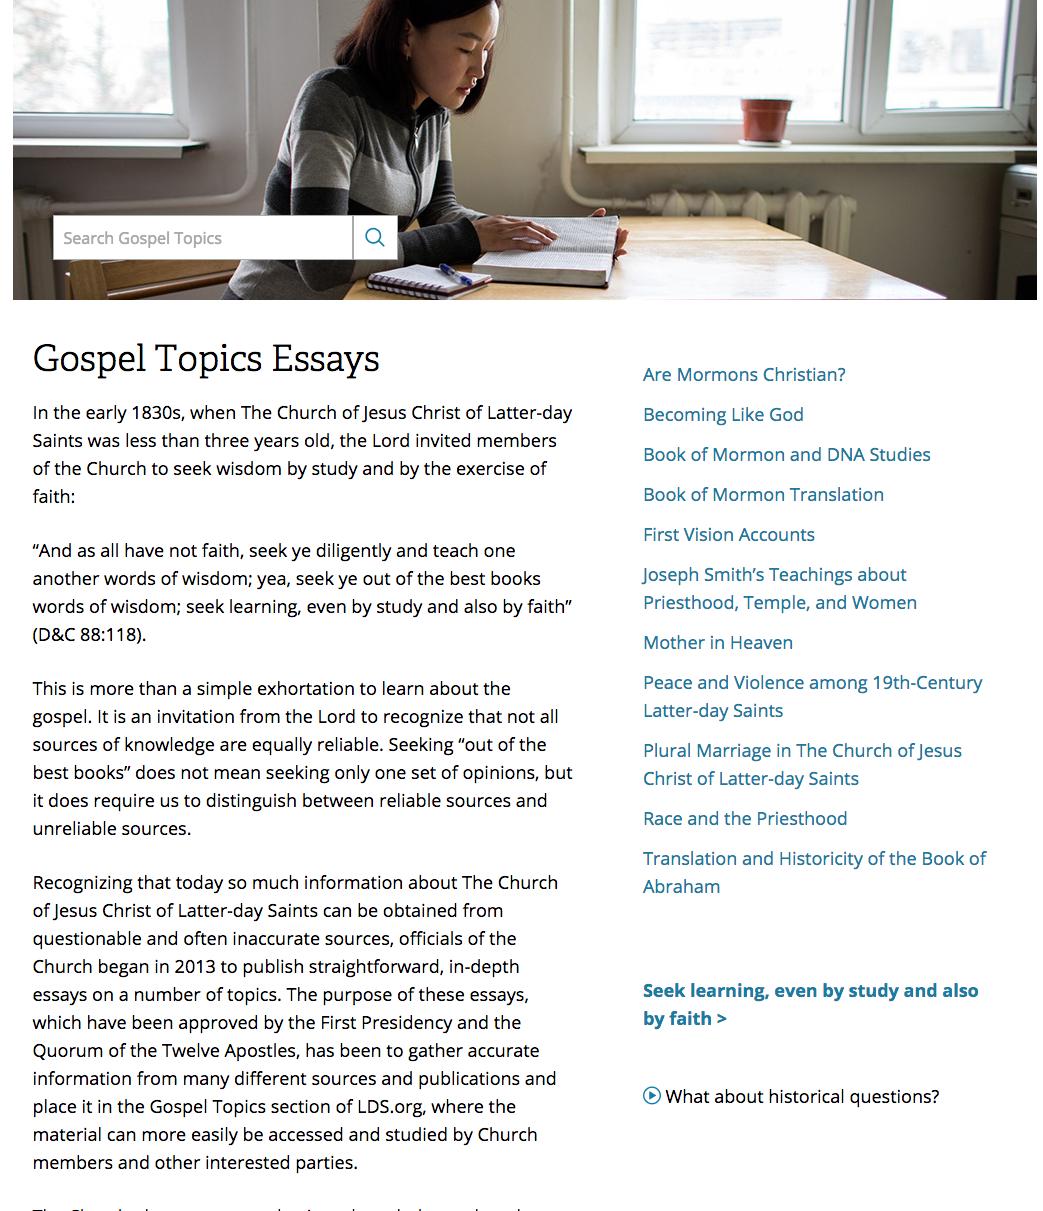 014 Screen20shot202016 1620at208 0920pm Gospel Topics Essays Essay Outstanding Book Of Abraham Pdf Mormon Translation Full